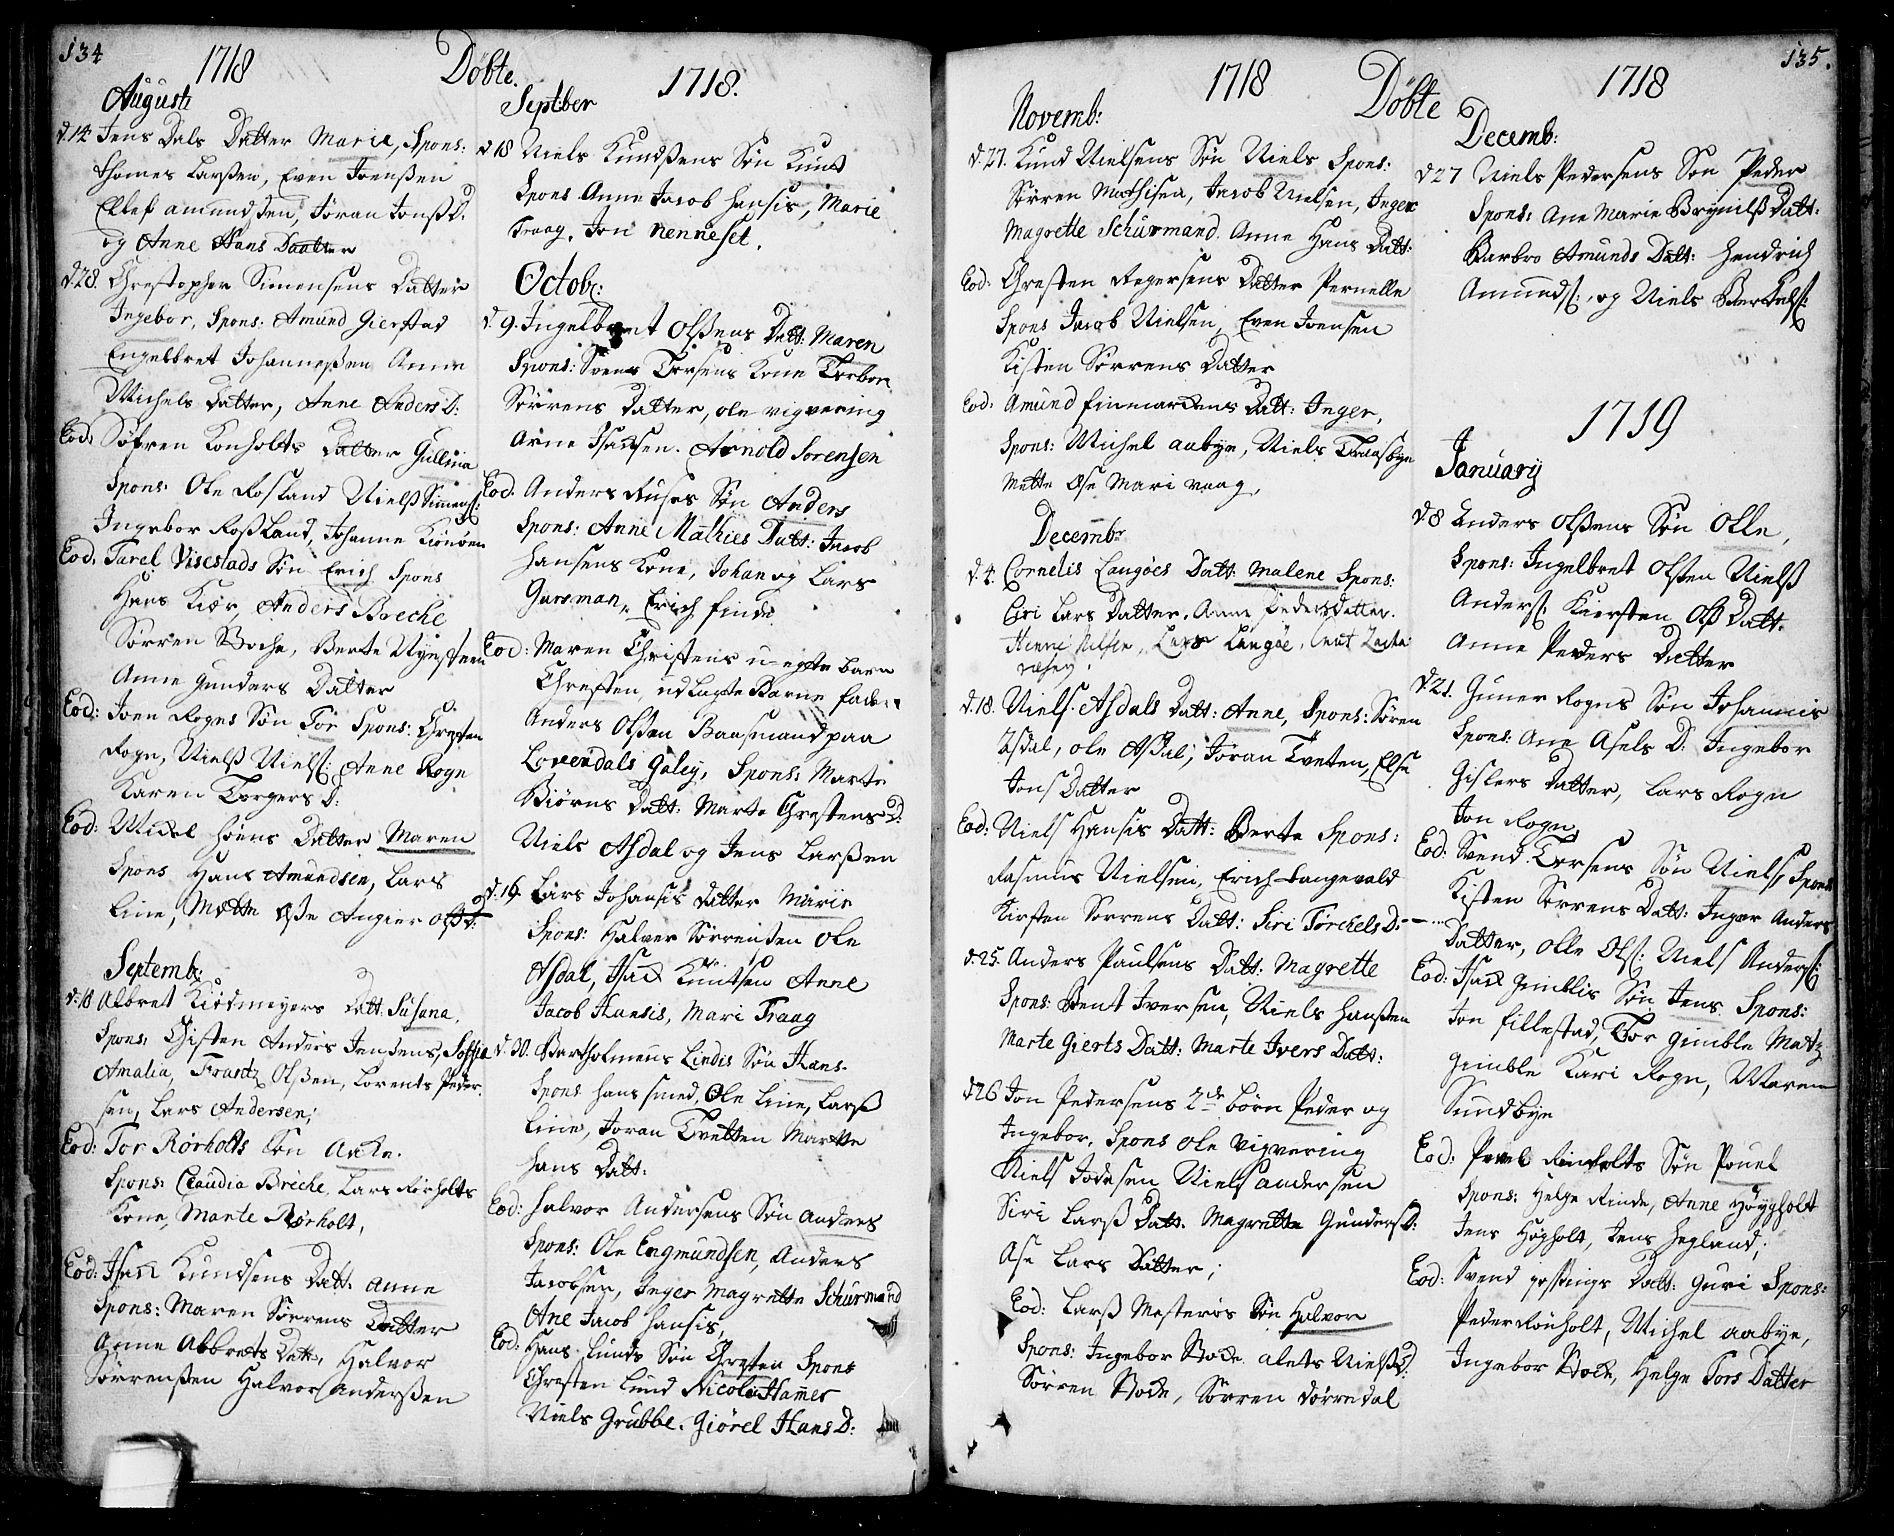 SAKO, Bamble kirkebøker, F/Fa/L0001: Ministerialbok nr. I 1, 1702-1774, s. 134-135